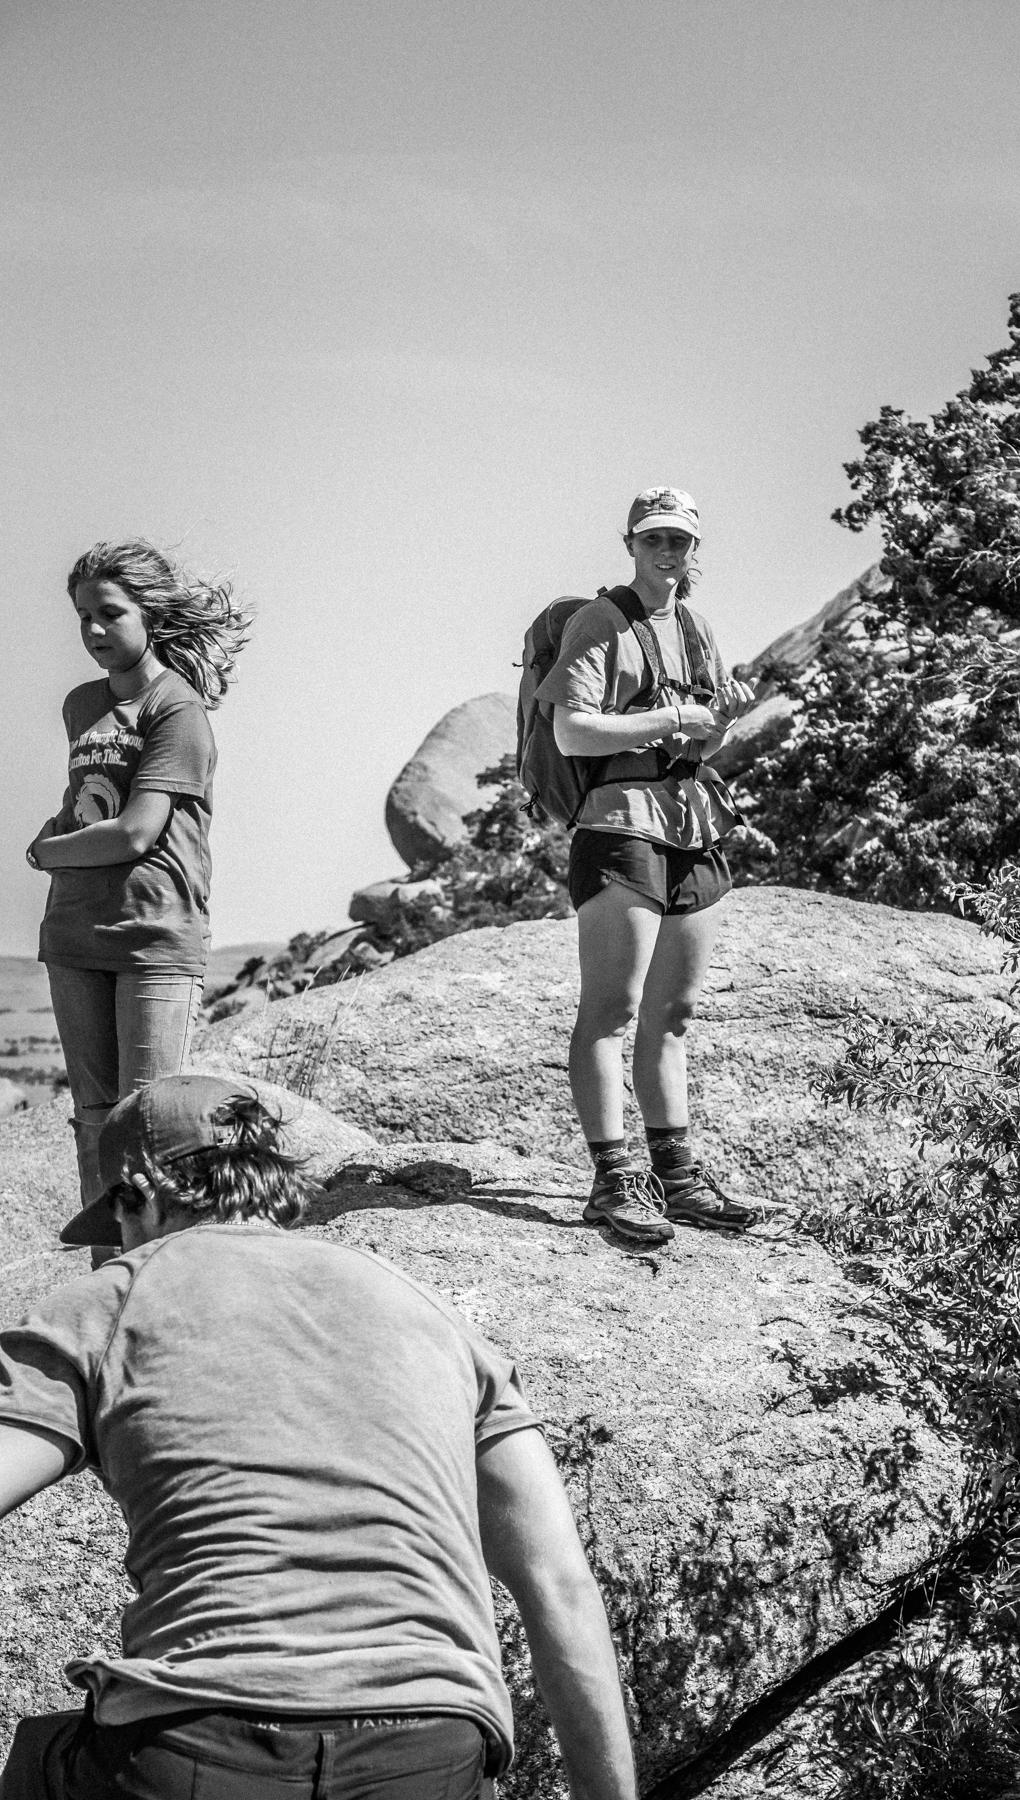 2017-08-05 Glass Mountain Peak B (18 of 20).jpg